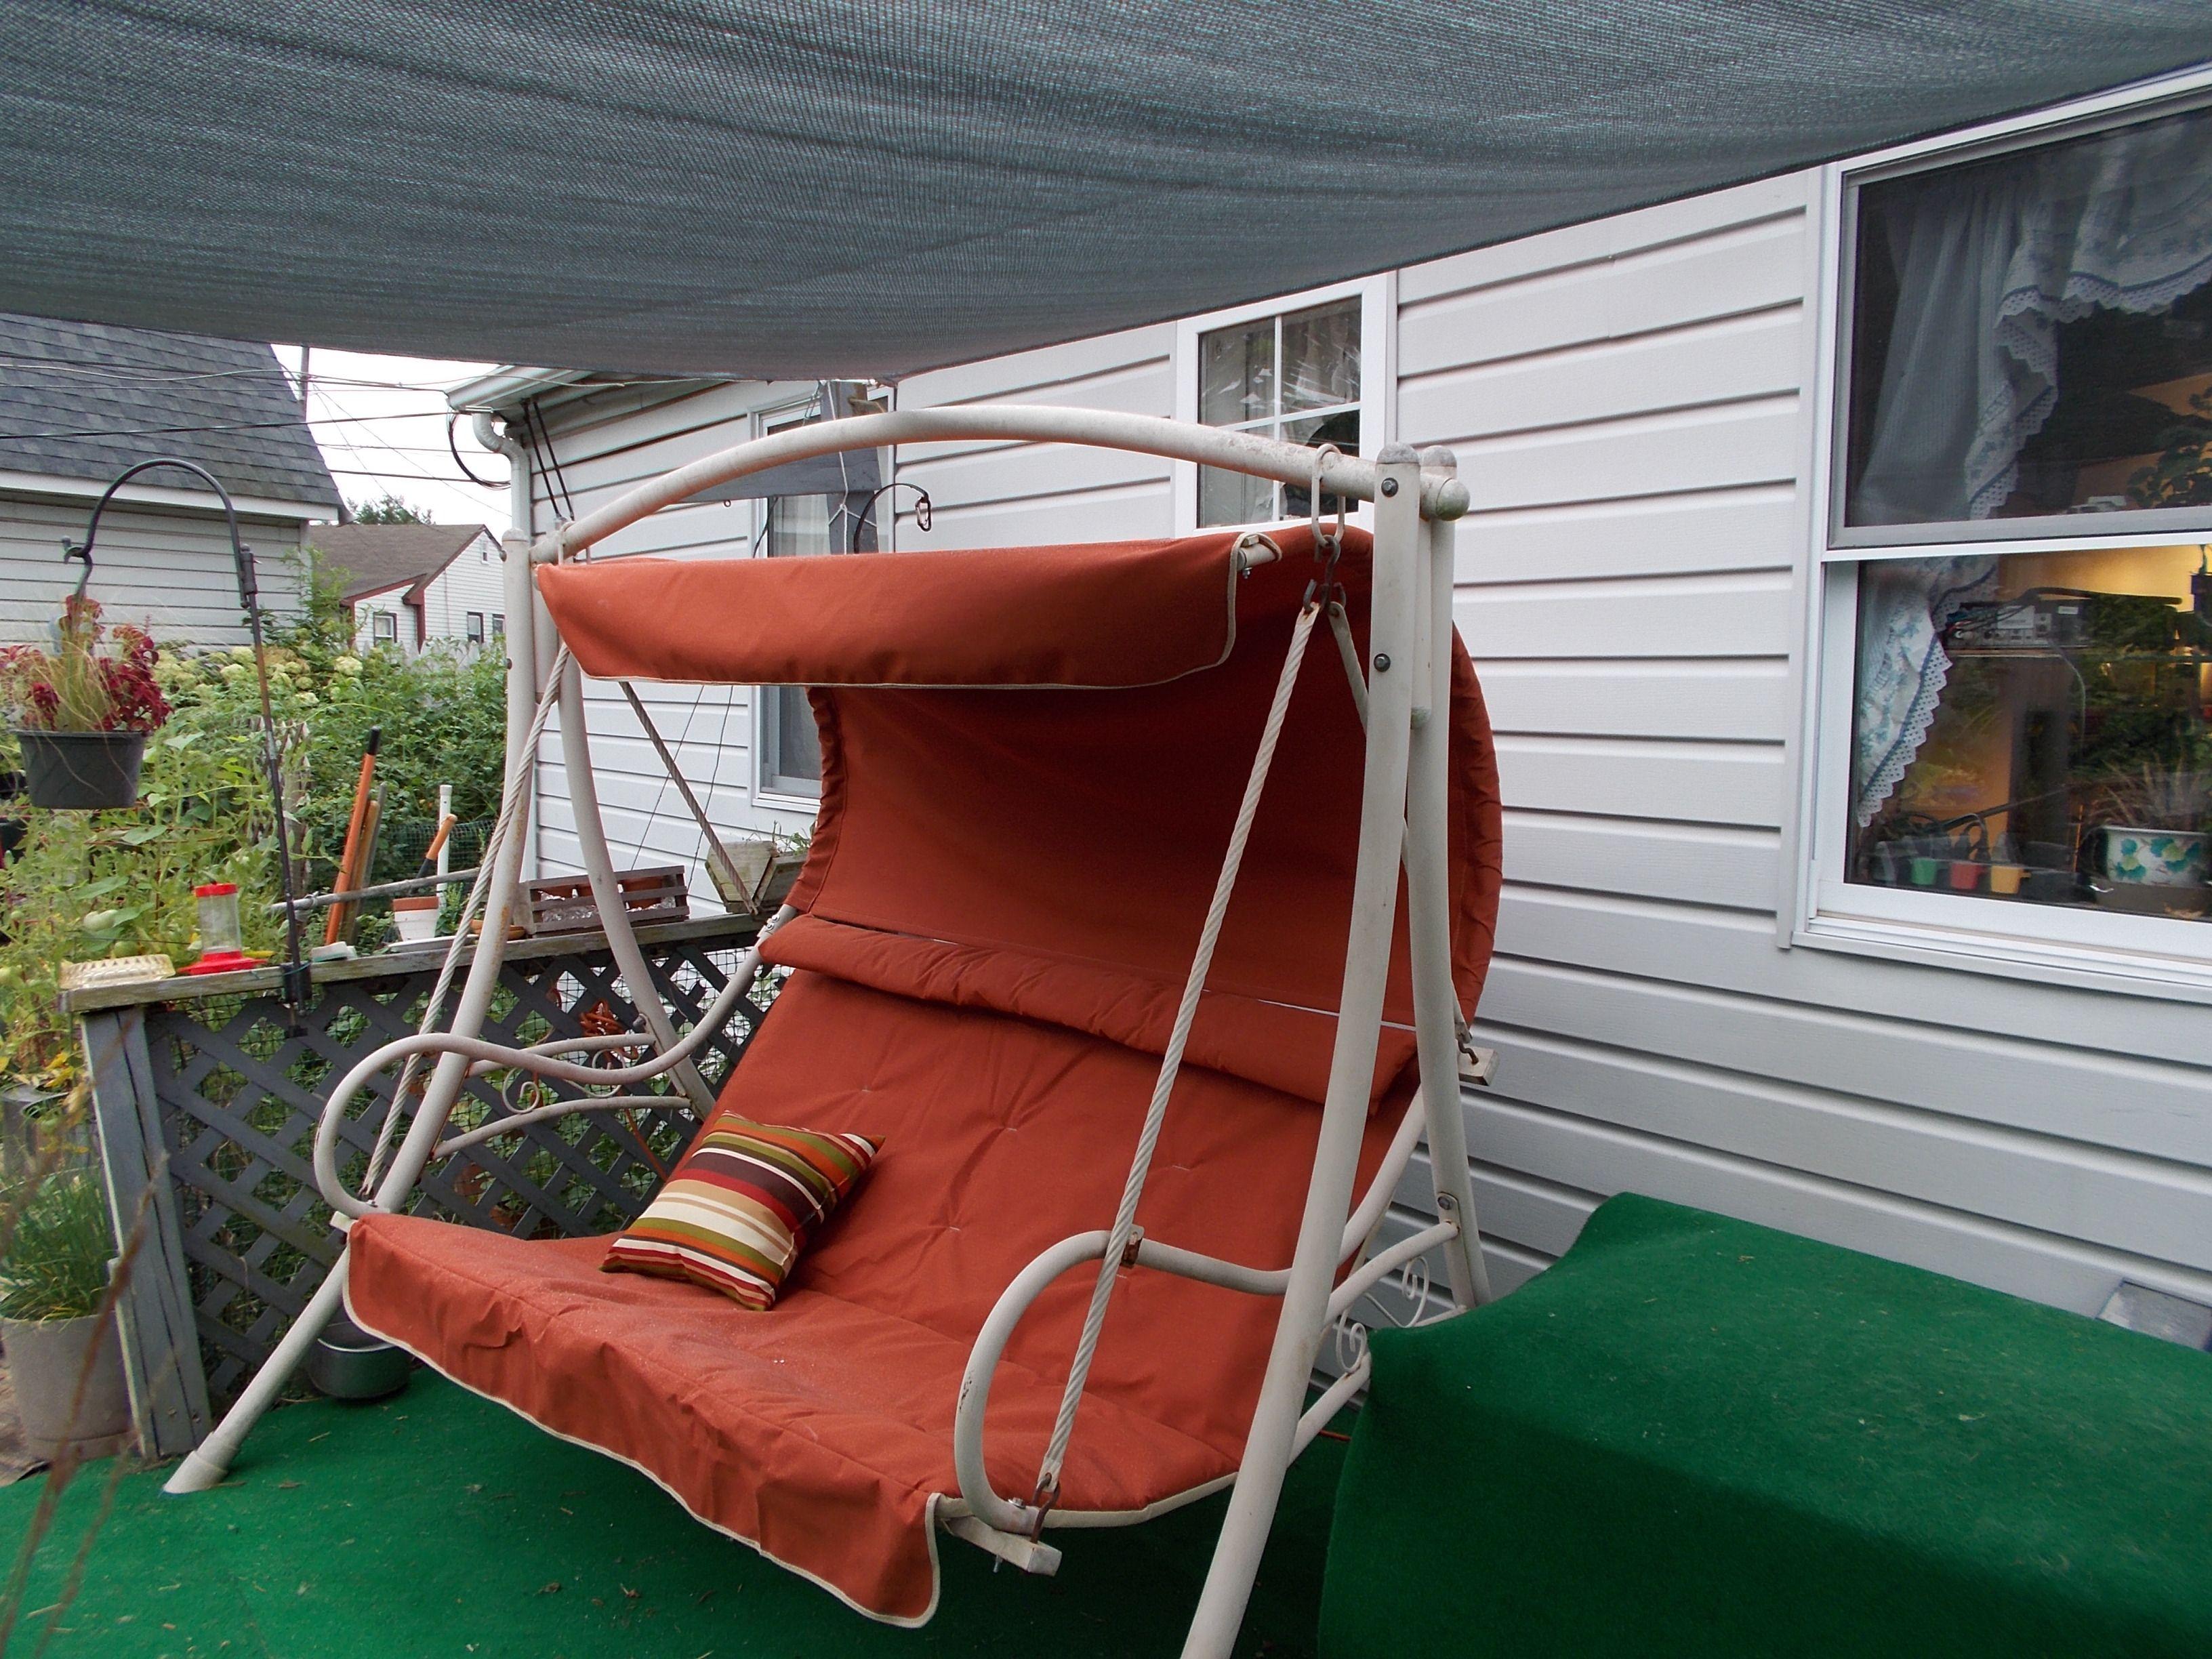 walmart suntime seville patio swing